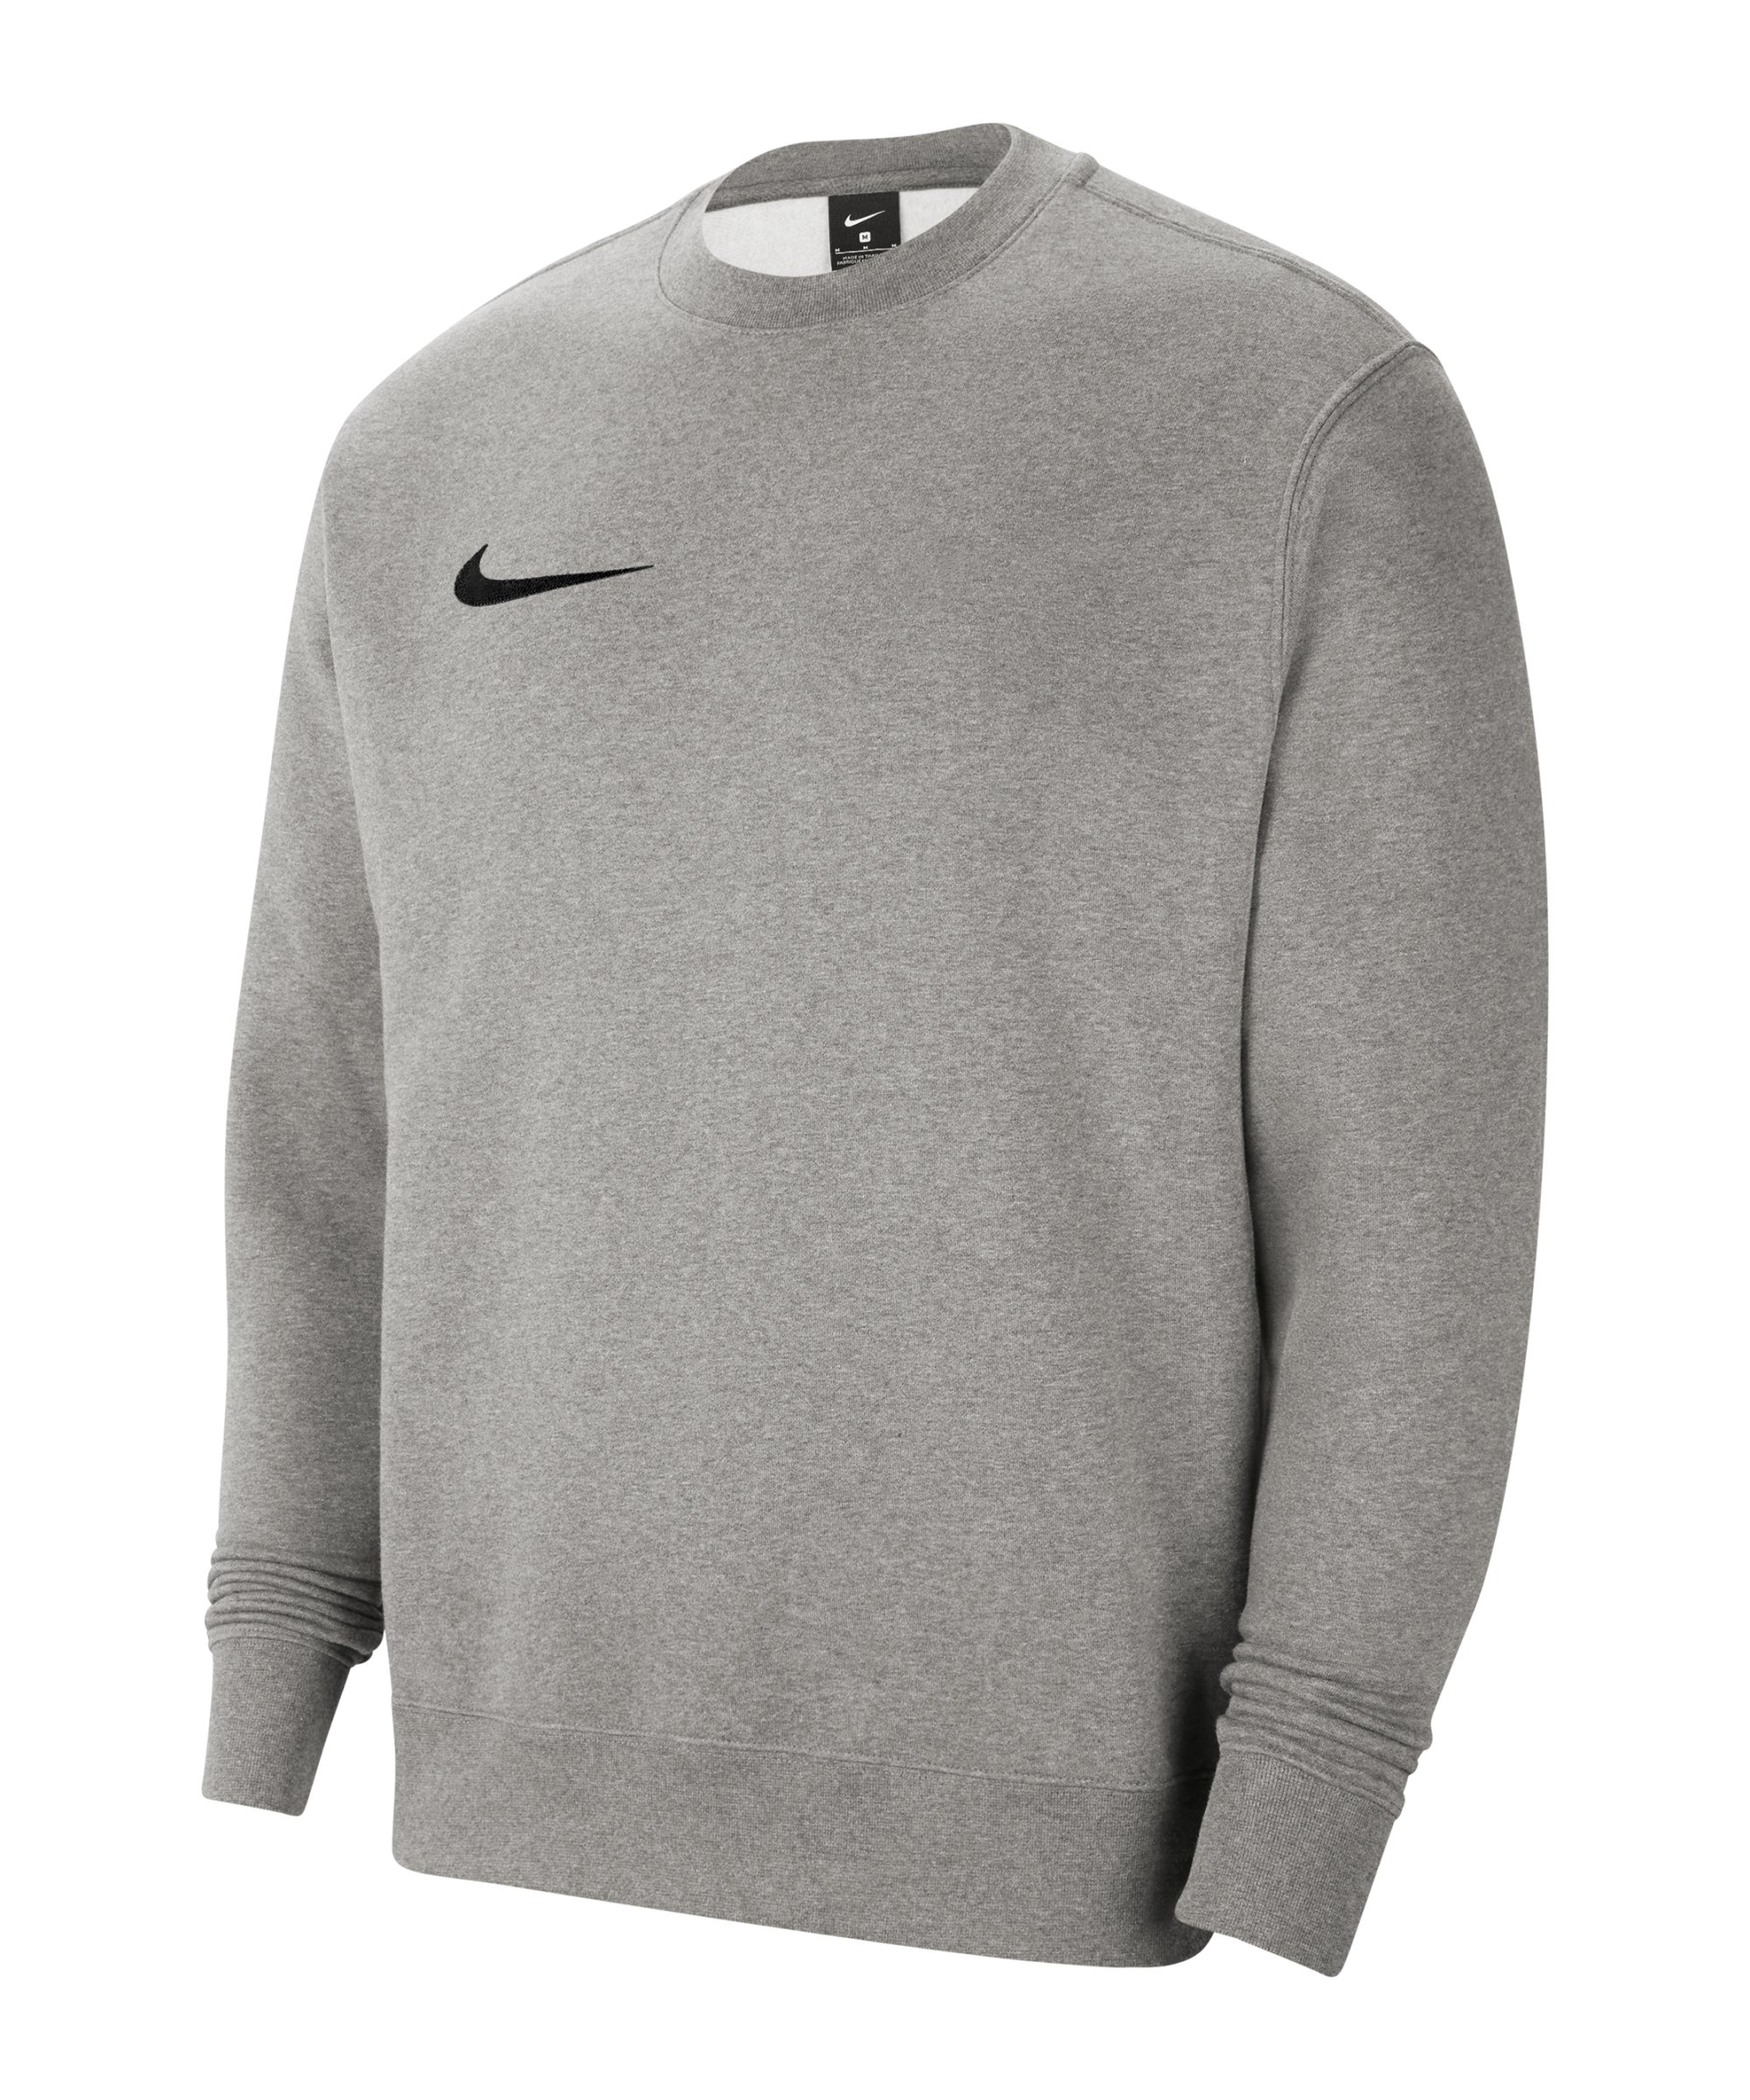 Nike Park 20 Fleece Sweatshirt Grau Schwarz F063 - grau